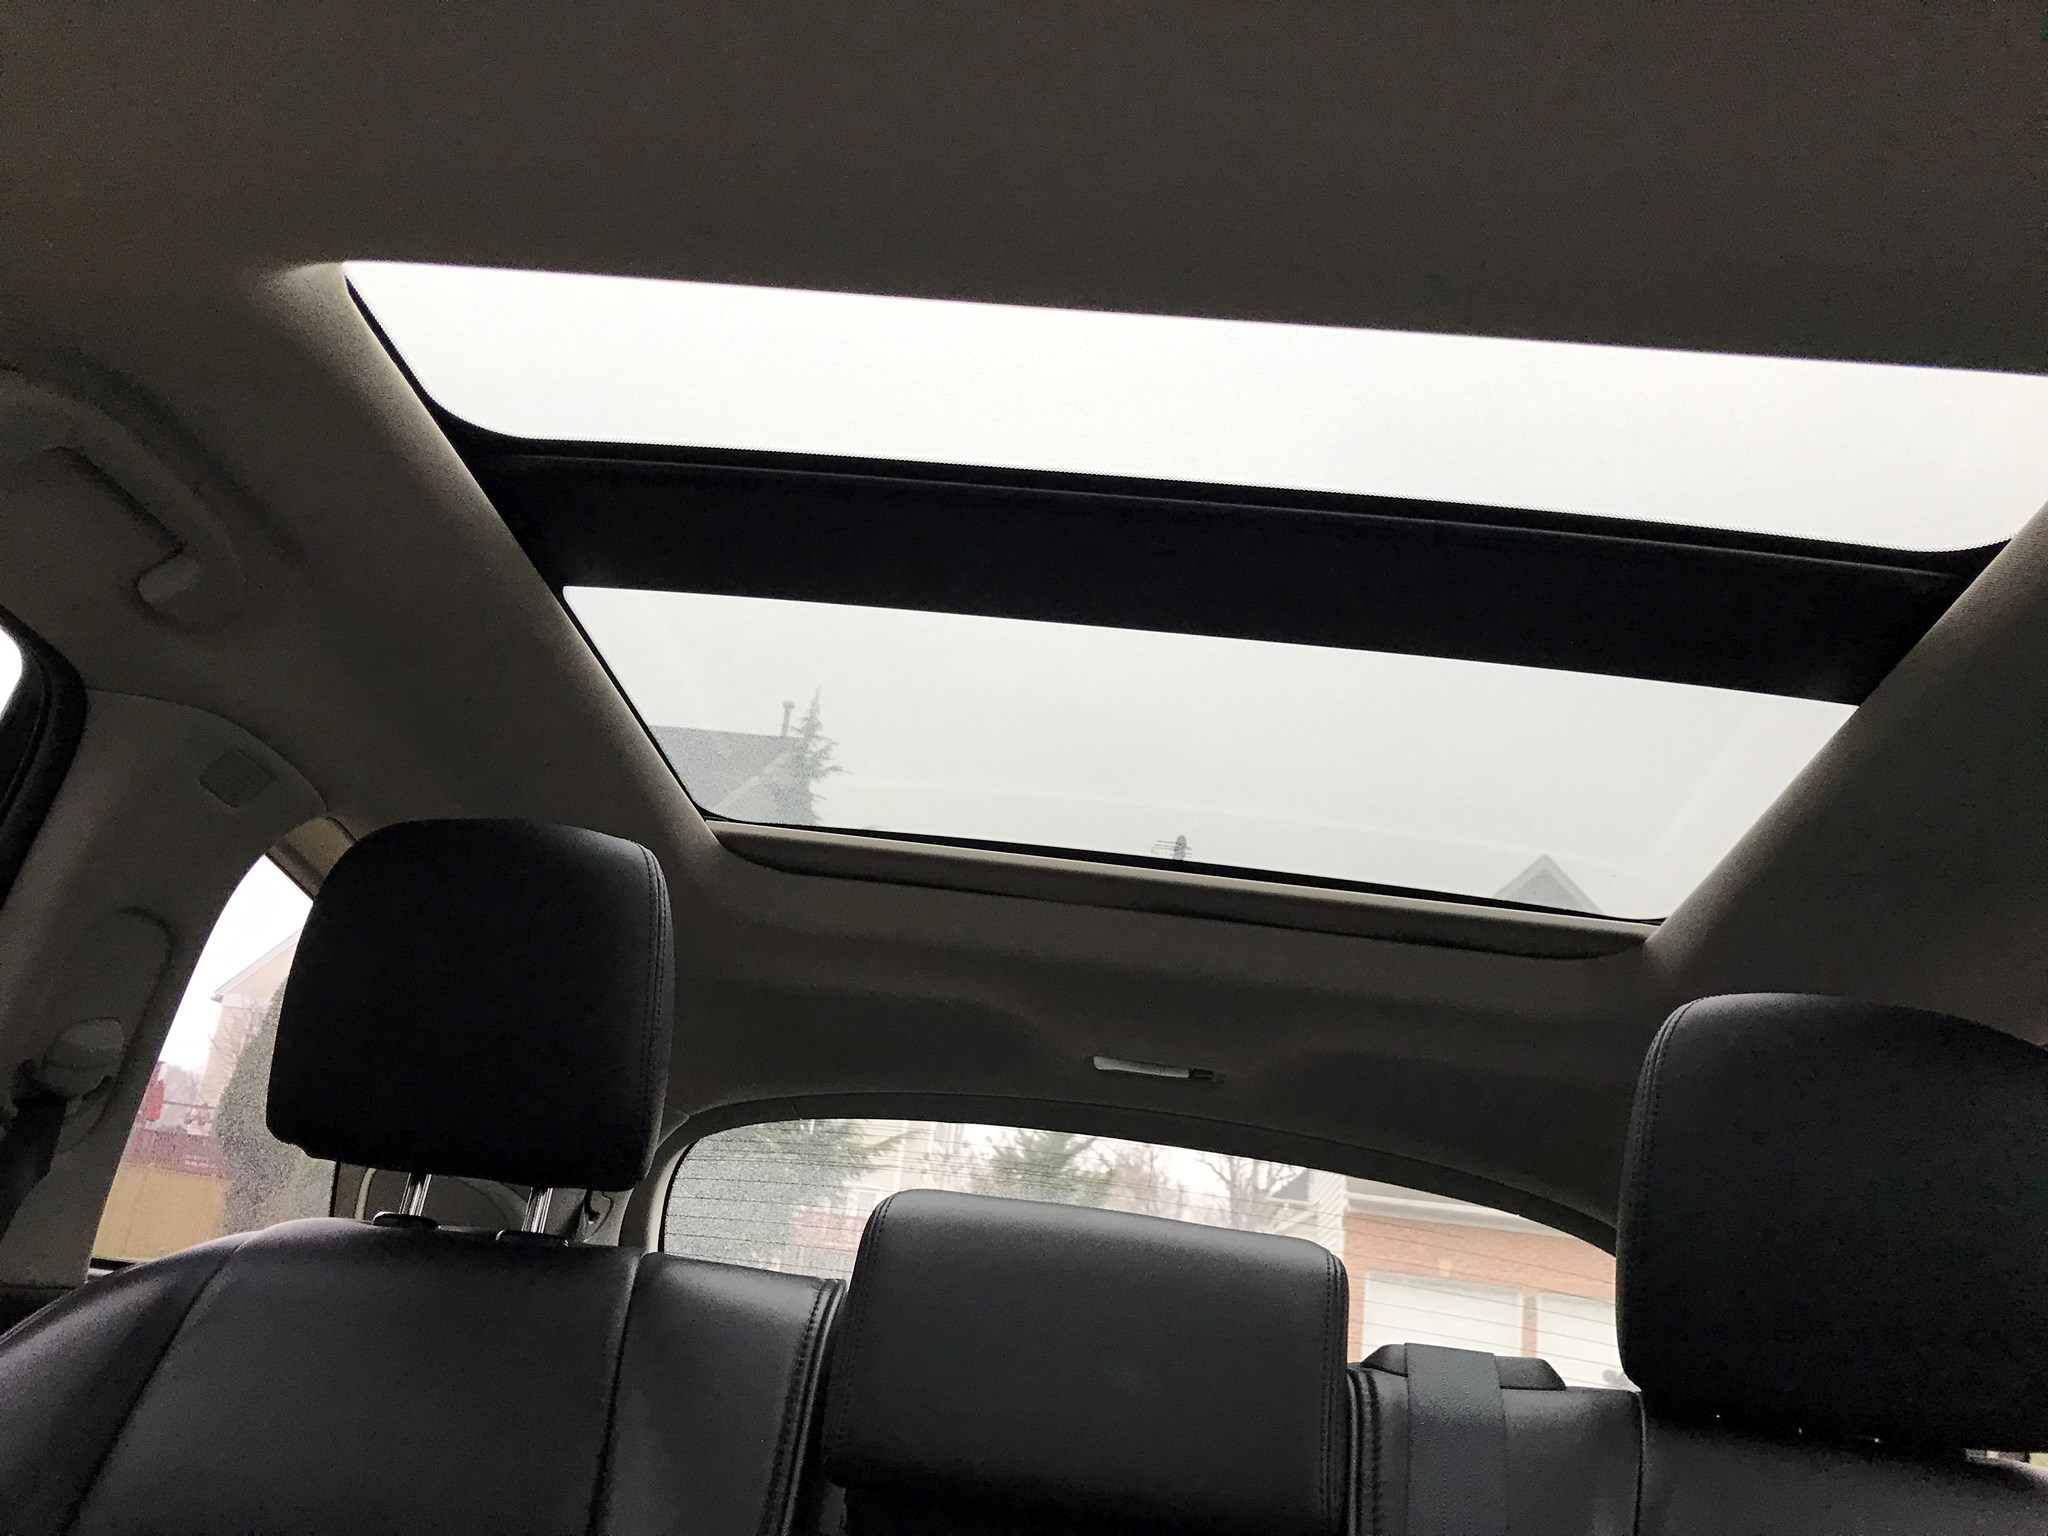 2015 INFINITI QX60 AWD - Navigation-Technology-DVD System